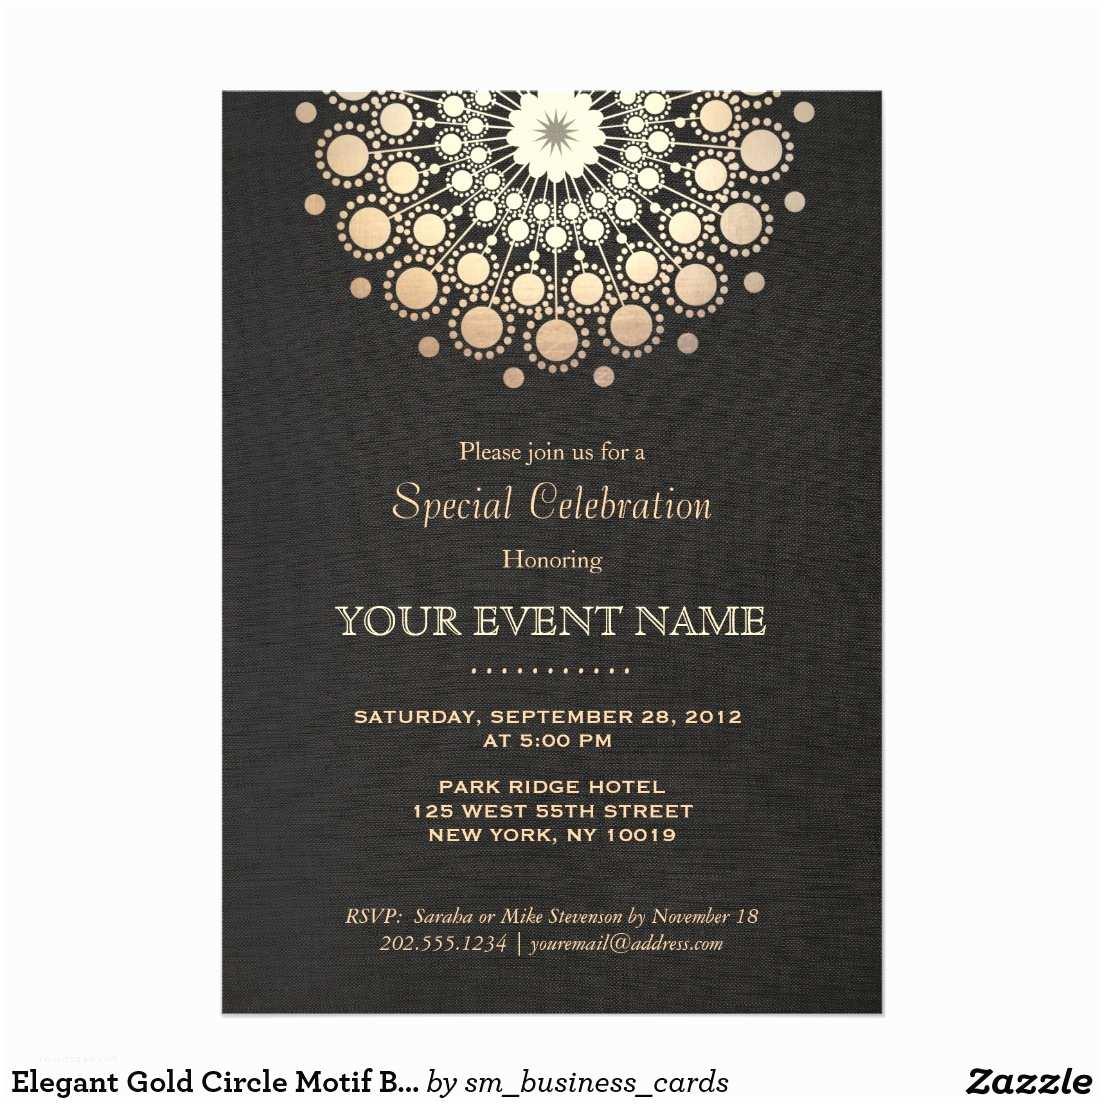 Elegant Party Invitations Fancy Dinner Party Invitations Invitation Librarry